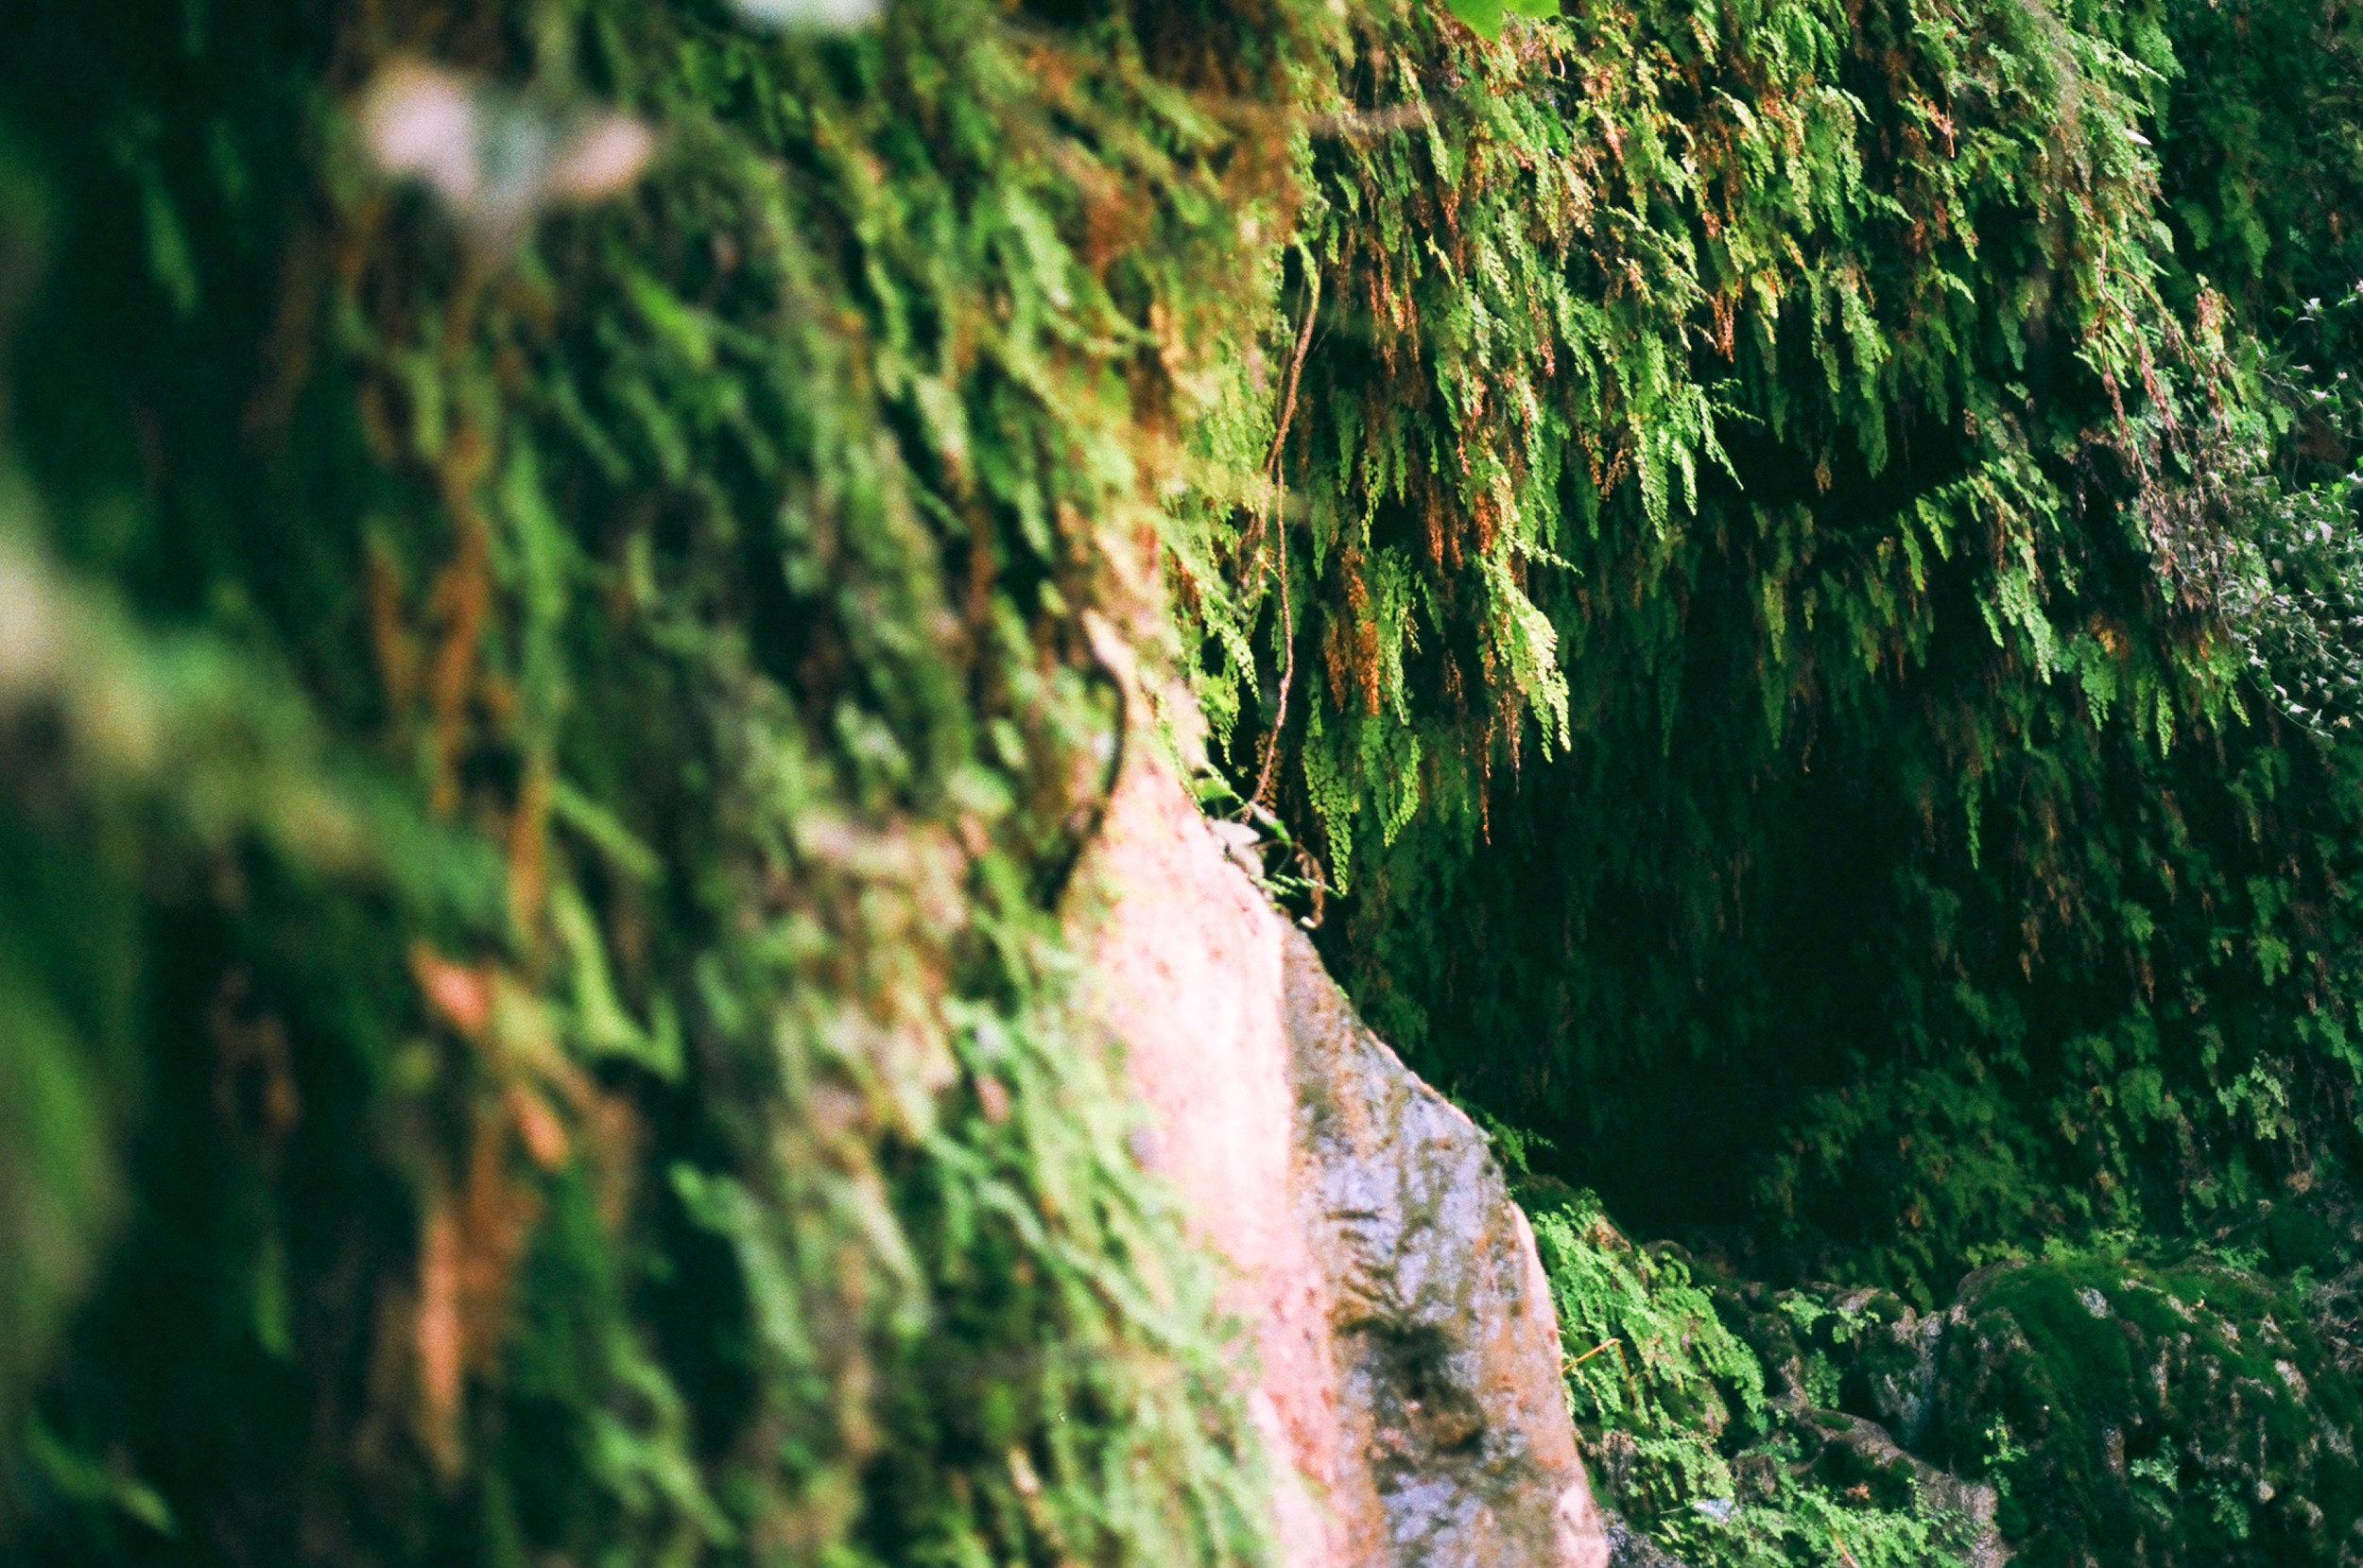 Ferns growing along the waterfall at Ein Gedi